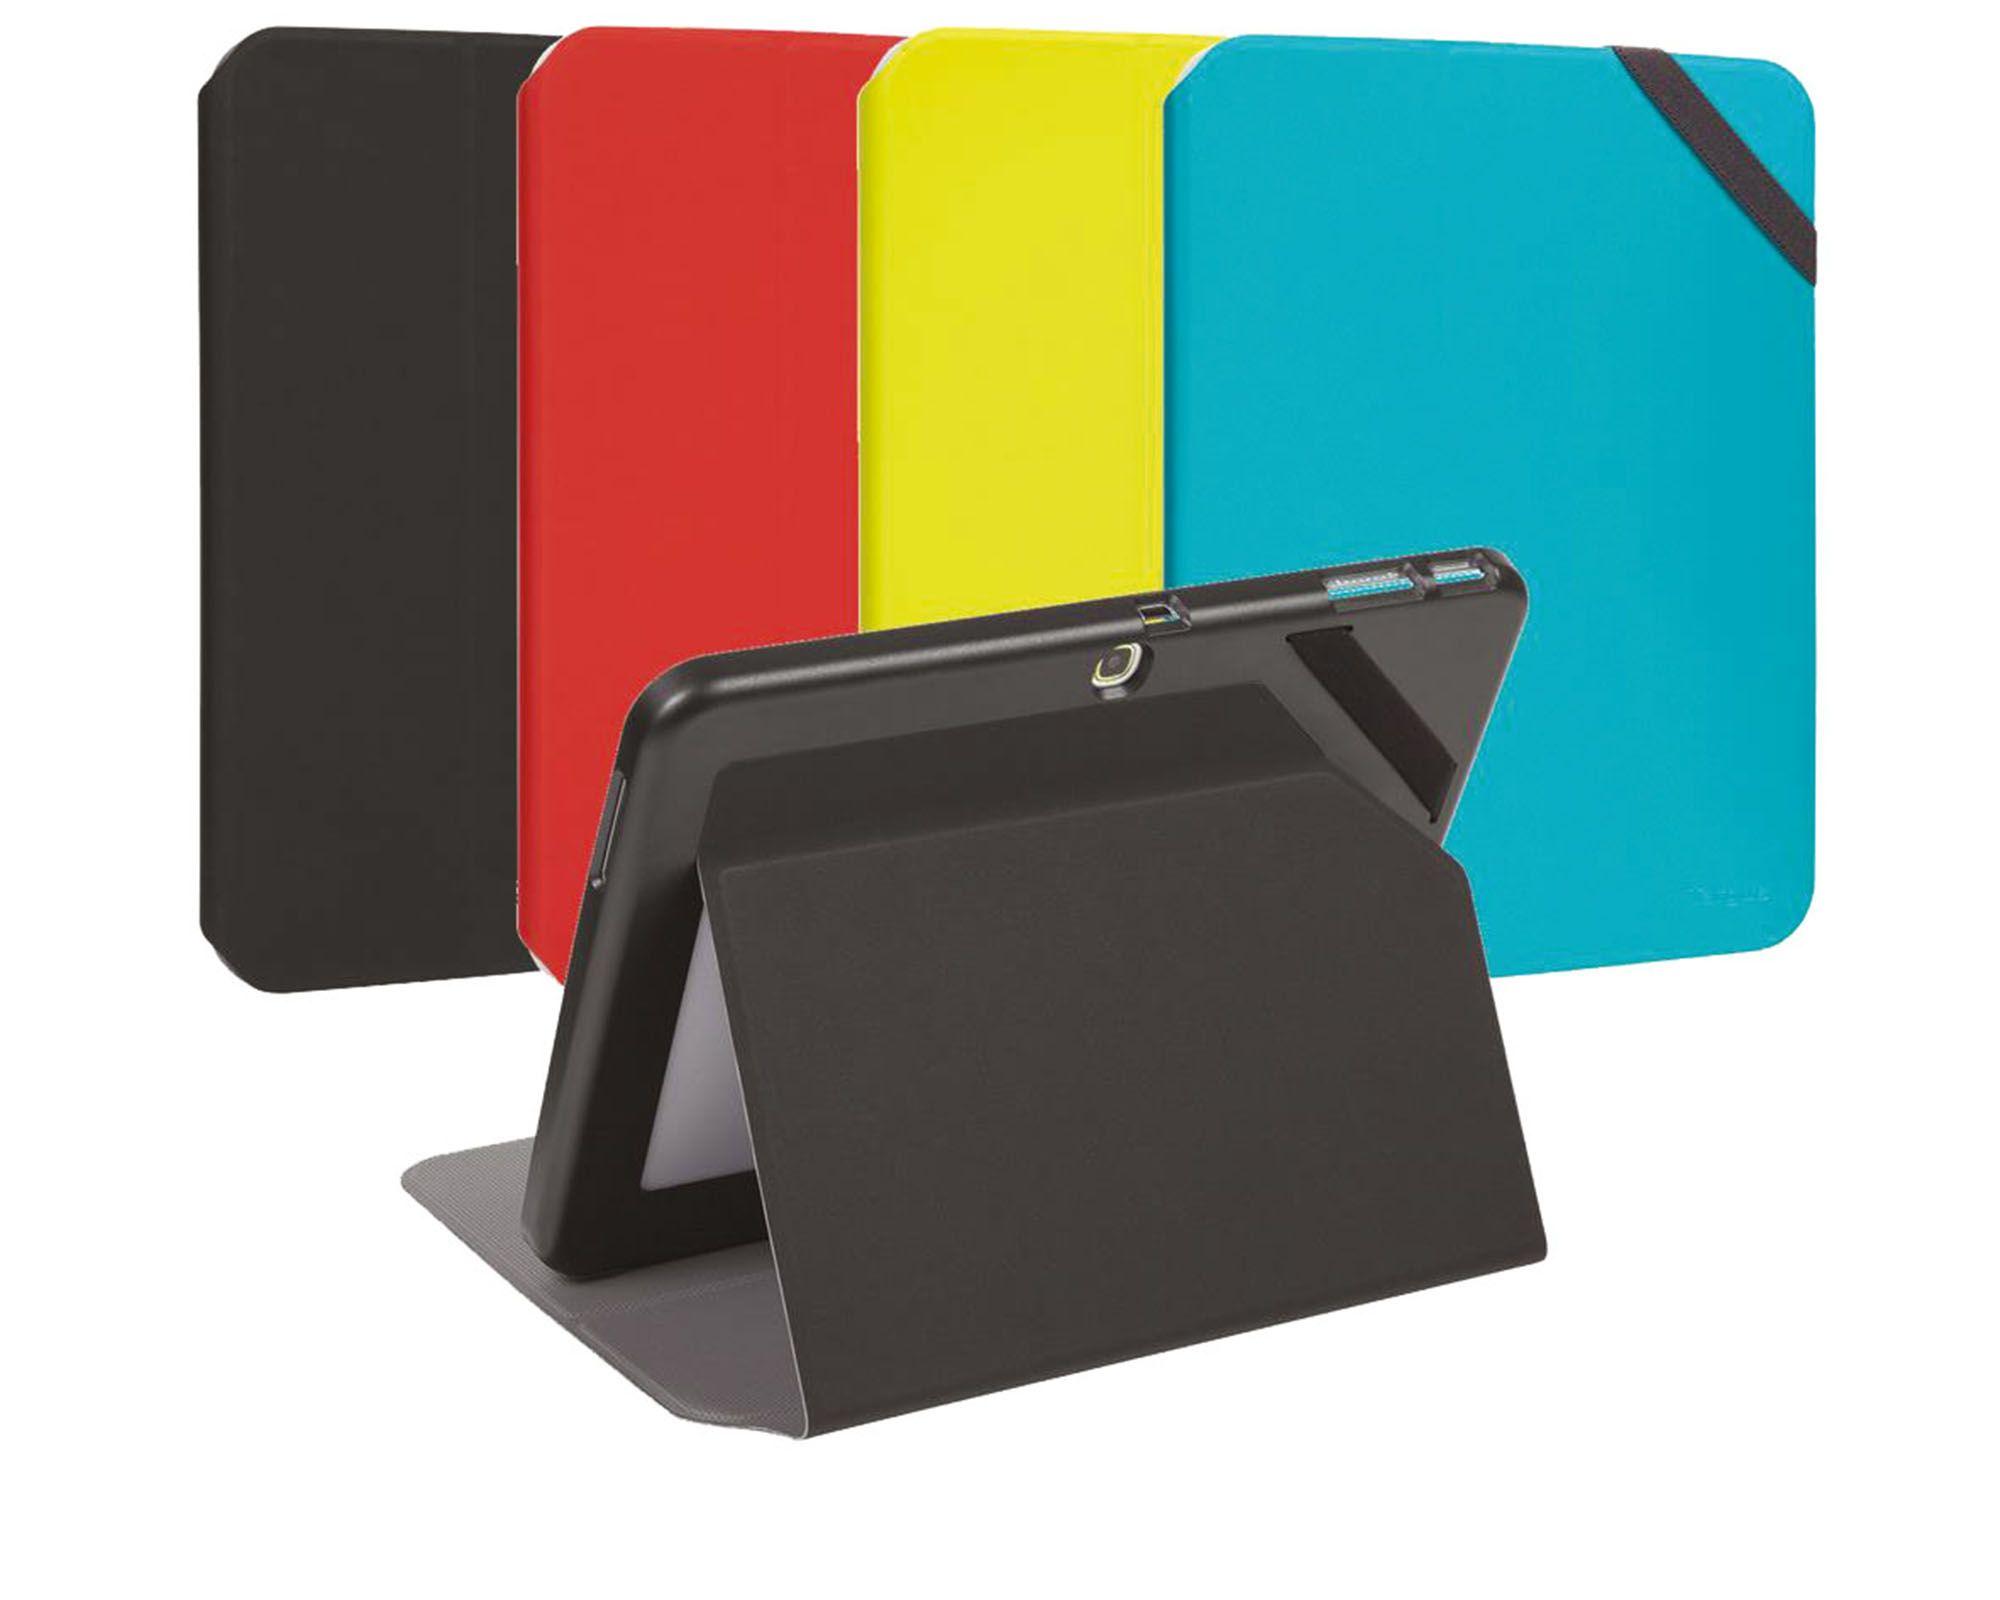 [CATALOGUE GENERAL 2015] Evervu. Etui ultra léger pour protéger votre tablette (Samsung Galaxy Tab 4 et iPad). TAB4 10,1'' | REF. THZ452EU - NOIR | REF. THZ45202EU - BLEU | REF. THZ45203EU - ROUGE | REF. THZ45205EU - JAUNE | TAB 4 8'' | REF. THZ449EU - NOIR | REF. THZ44902EU - BLEU | TAB 4 7'' | REF. THZ445EU - NOIR | REF. THZ44502EU - BLEU | RÉF. THZ44503EU - ROUGE | RÉF. THZ44505EU - JAUNE http://www.exertisbanquemagnetique.fr/info-marque/targus  #Targus #Etui #Galaxy